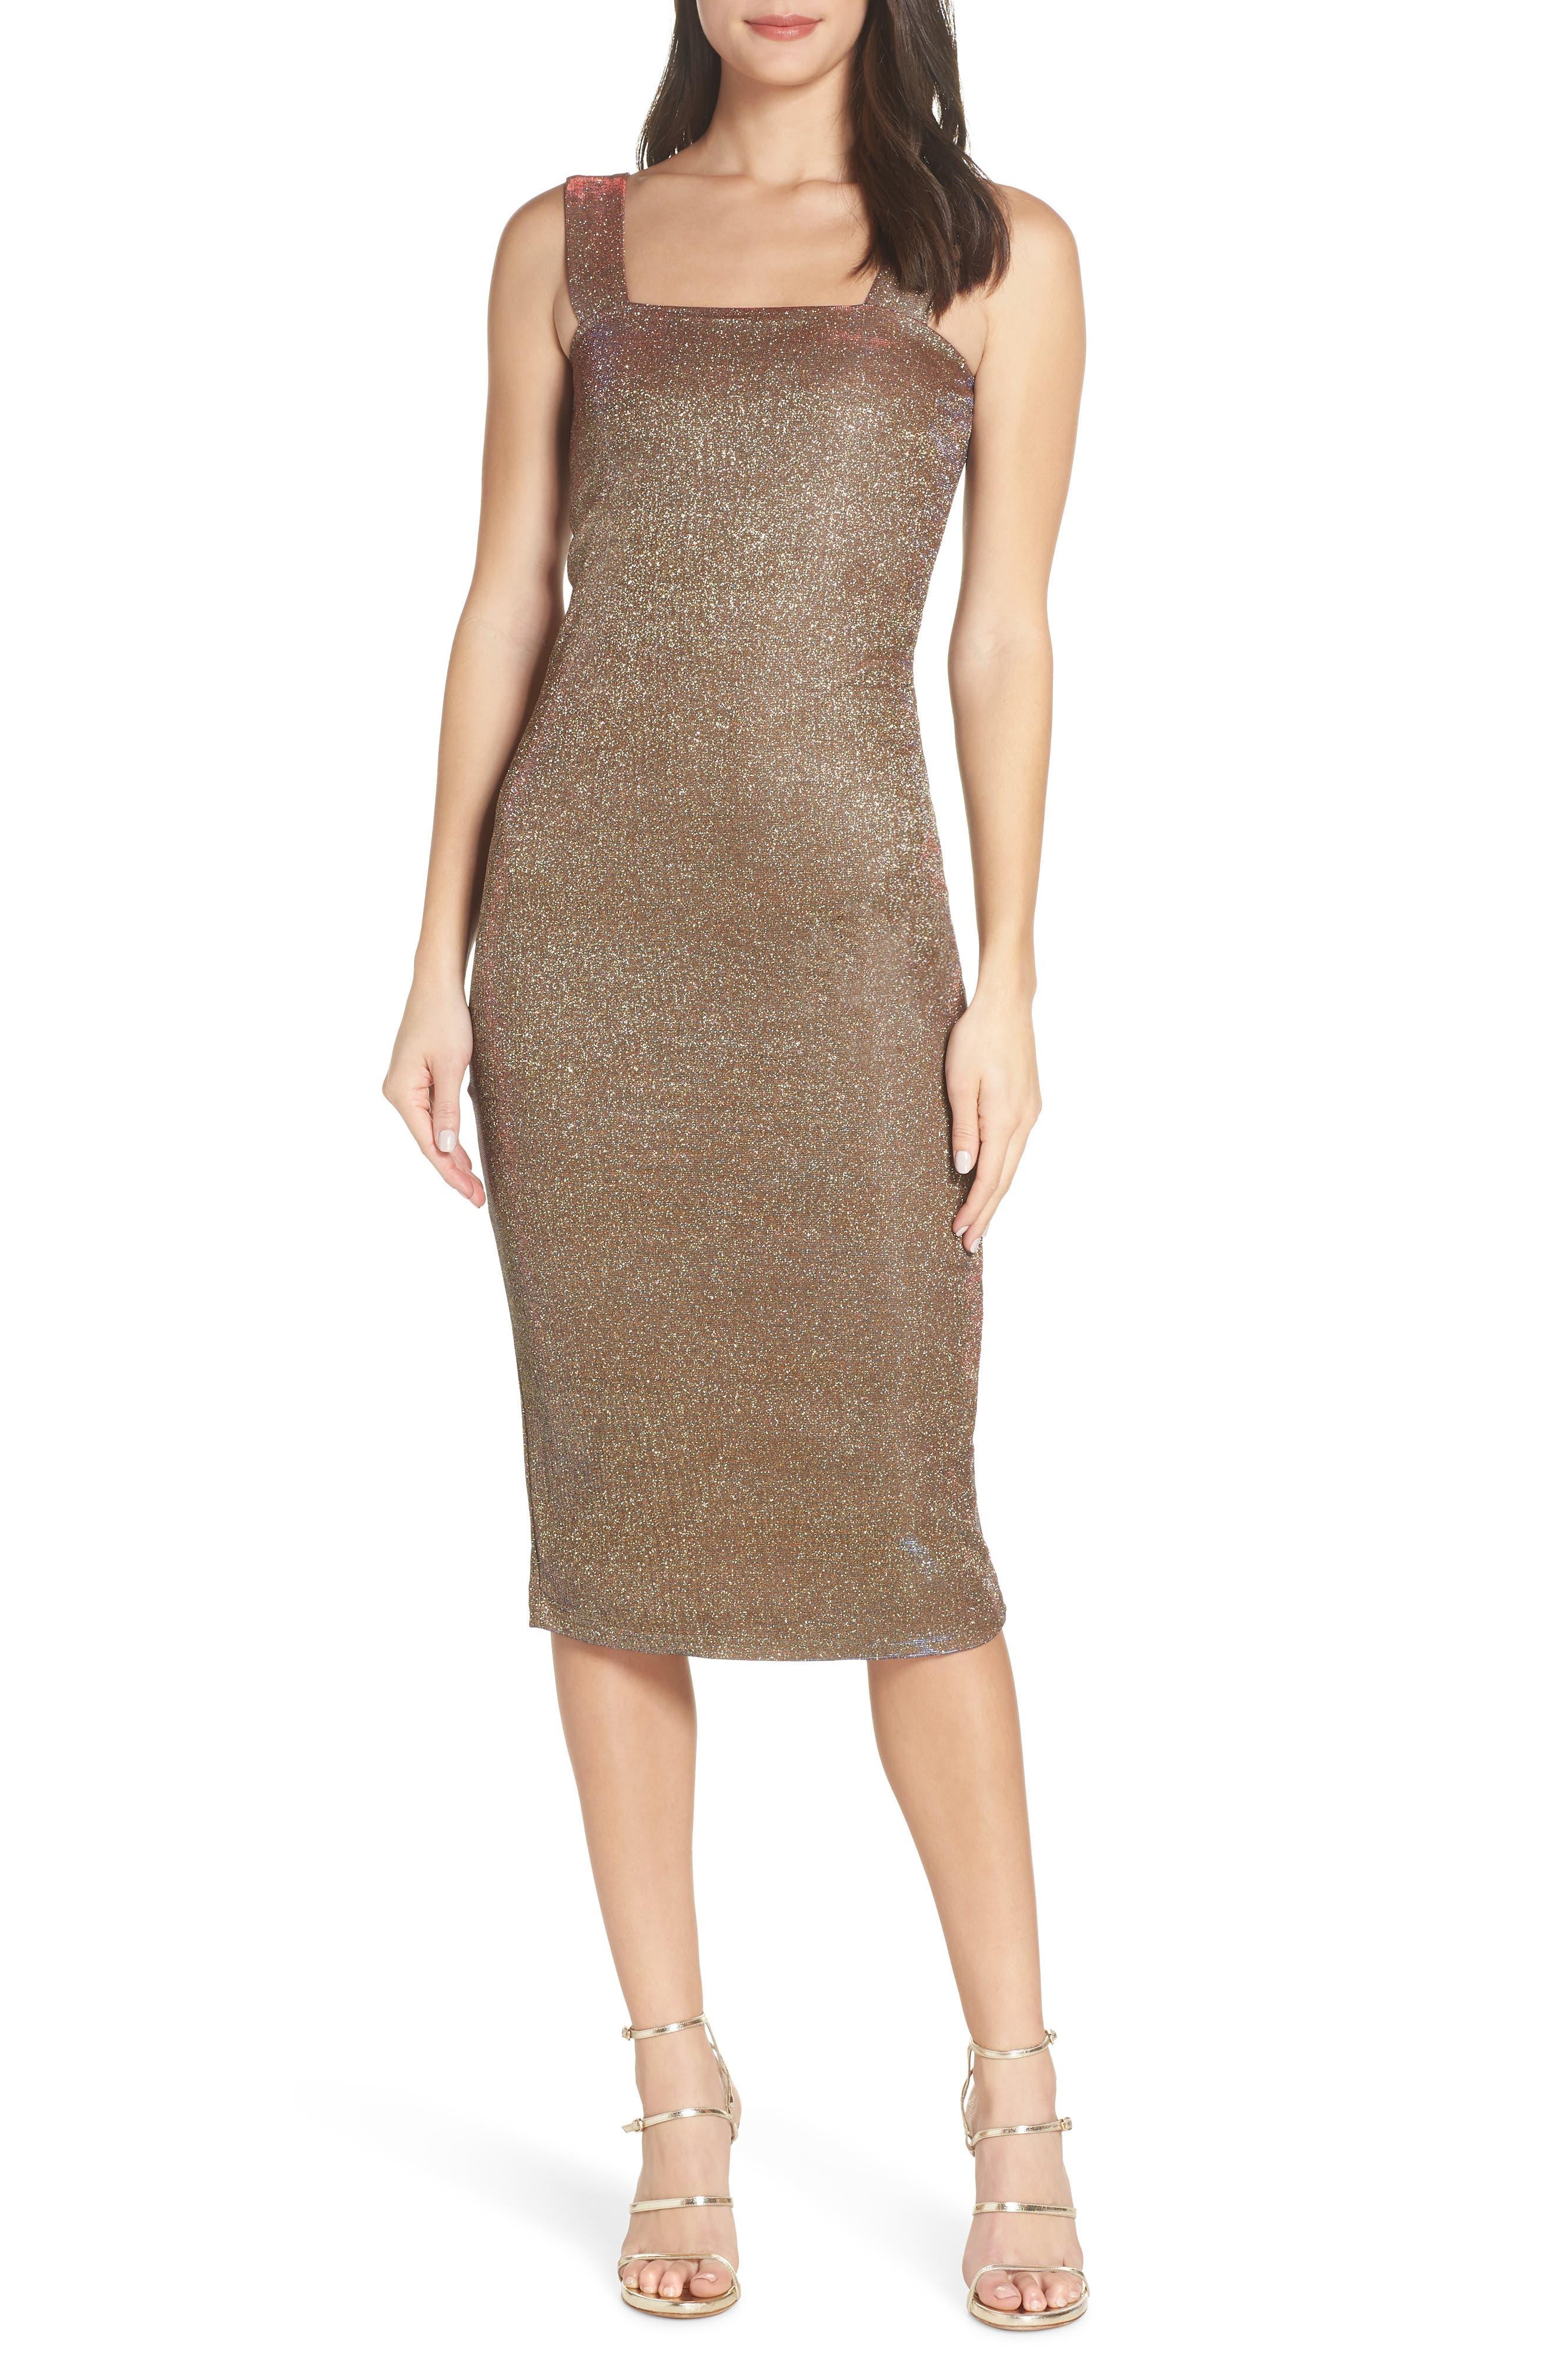 Mimi Sparkle Dress,                             Main thumbnail 1, color,                             GOLD